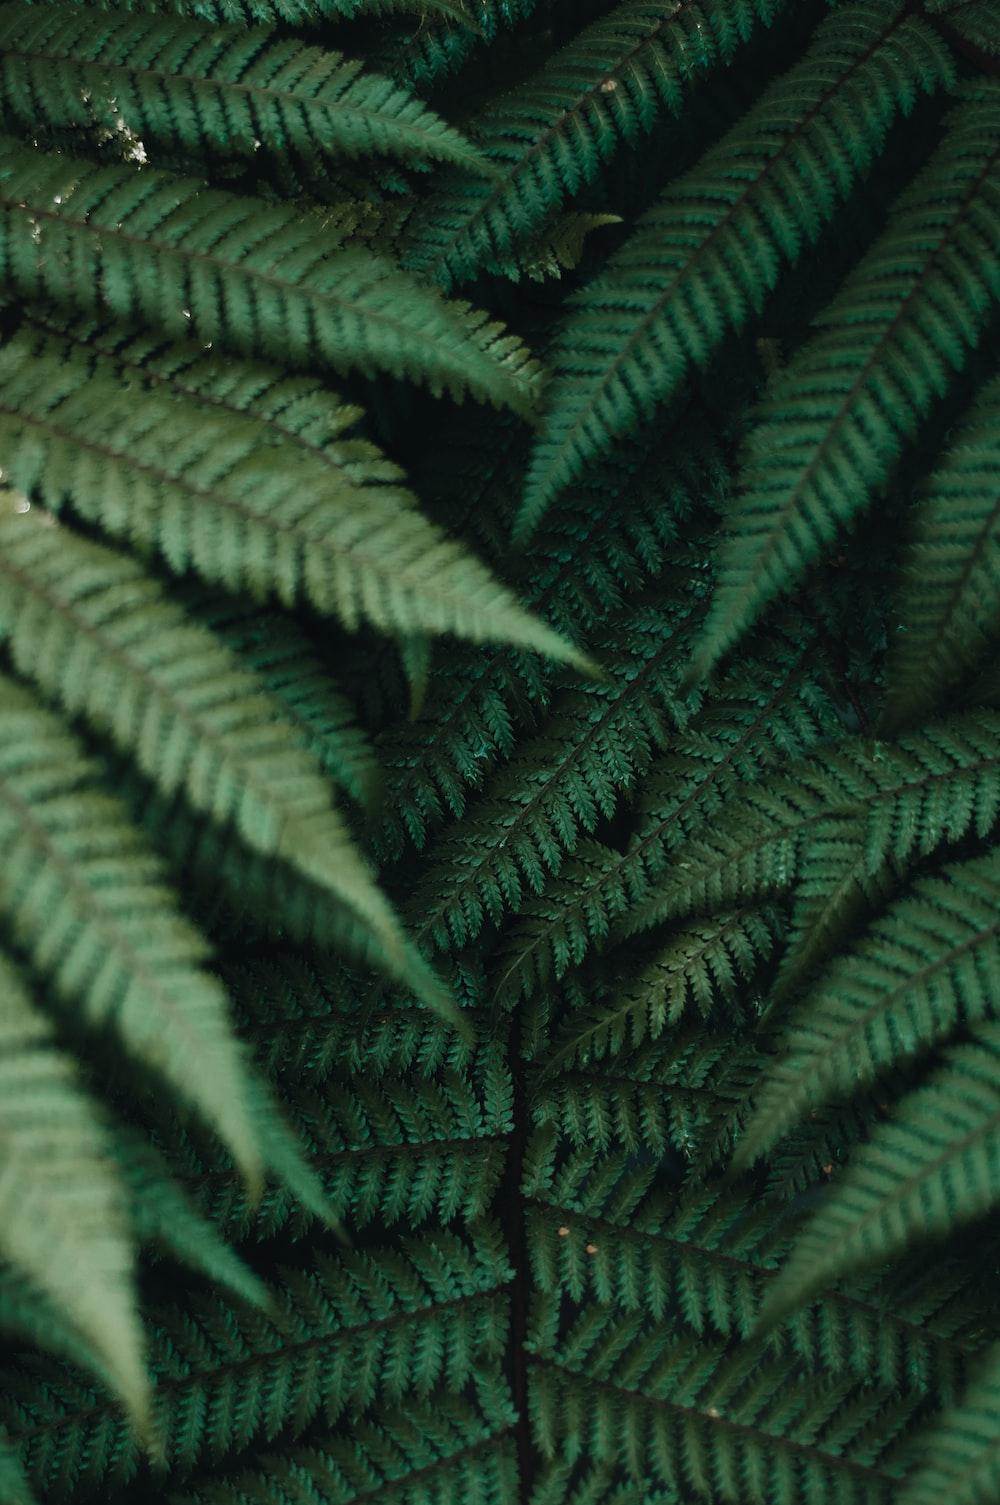 closeup photo of fern plant